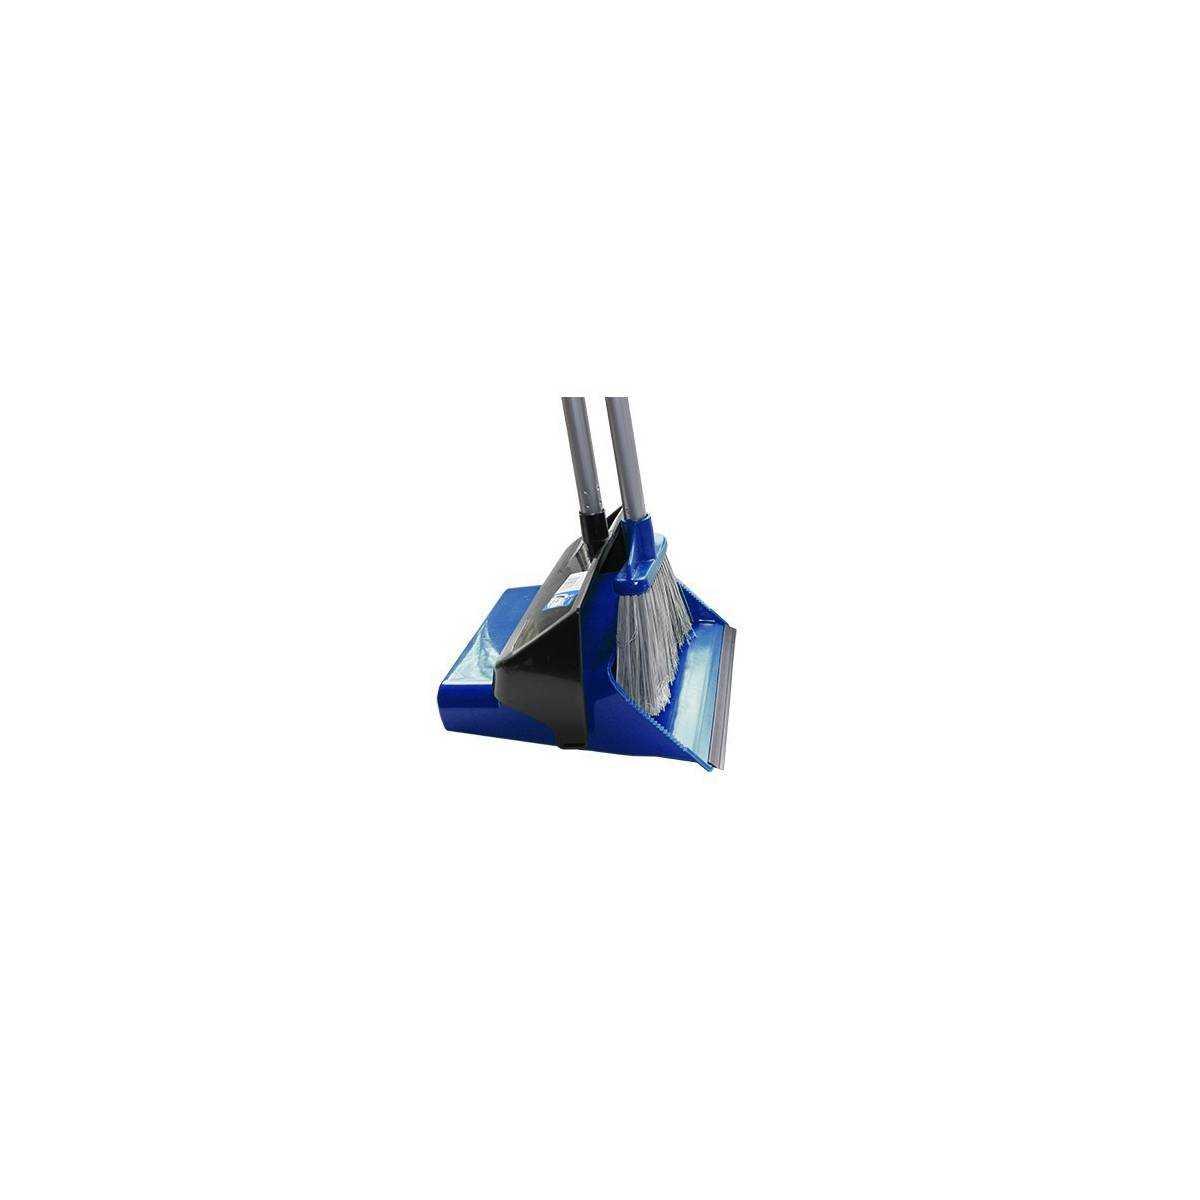 Набор для уборки совок+щетка DUSTER SET (Синего цвета) 12.00825.0006.02.071 APEX - Fratelli Re SpA